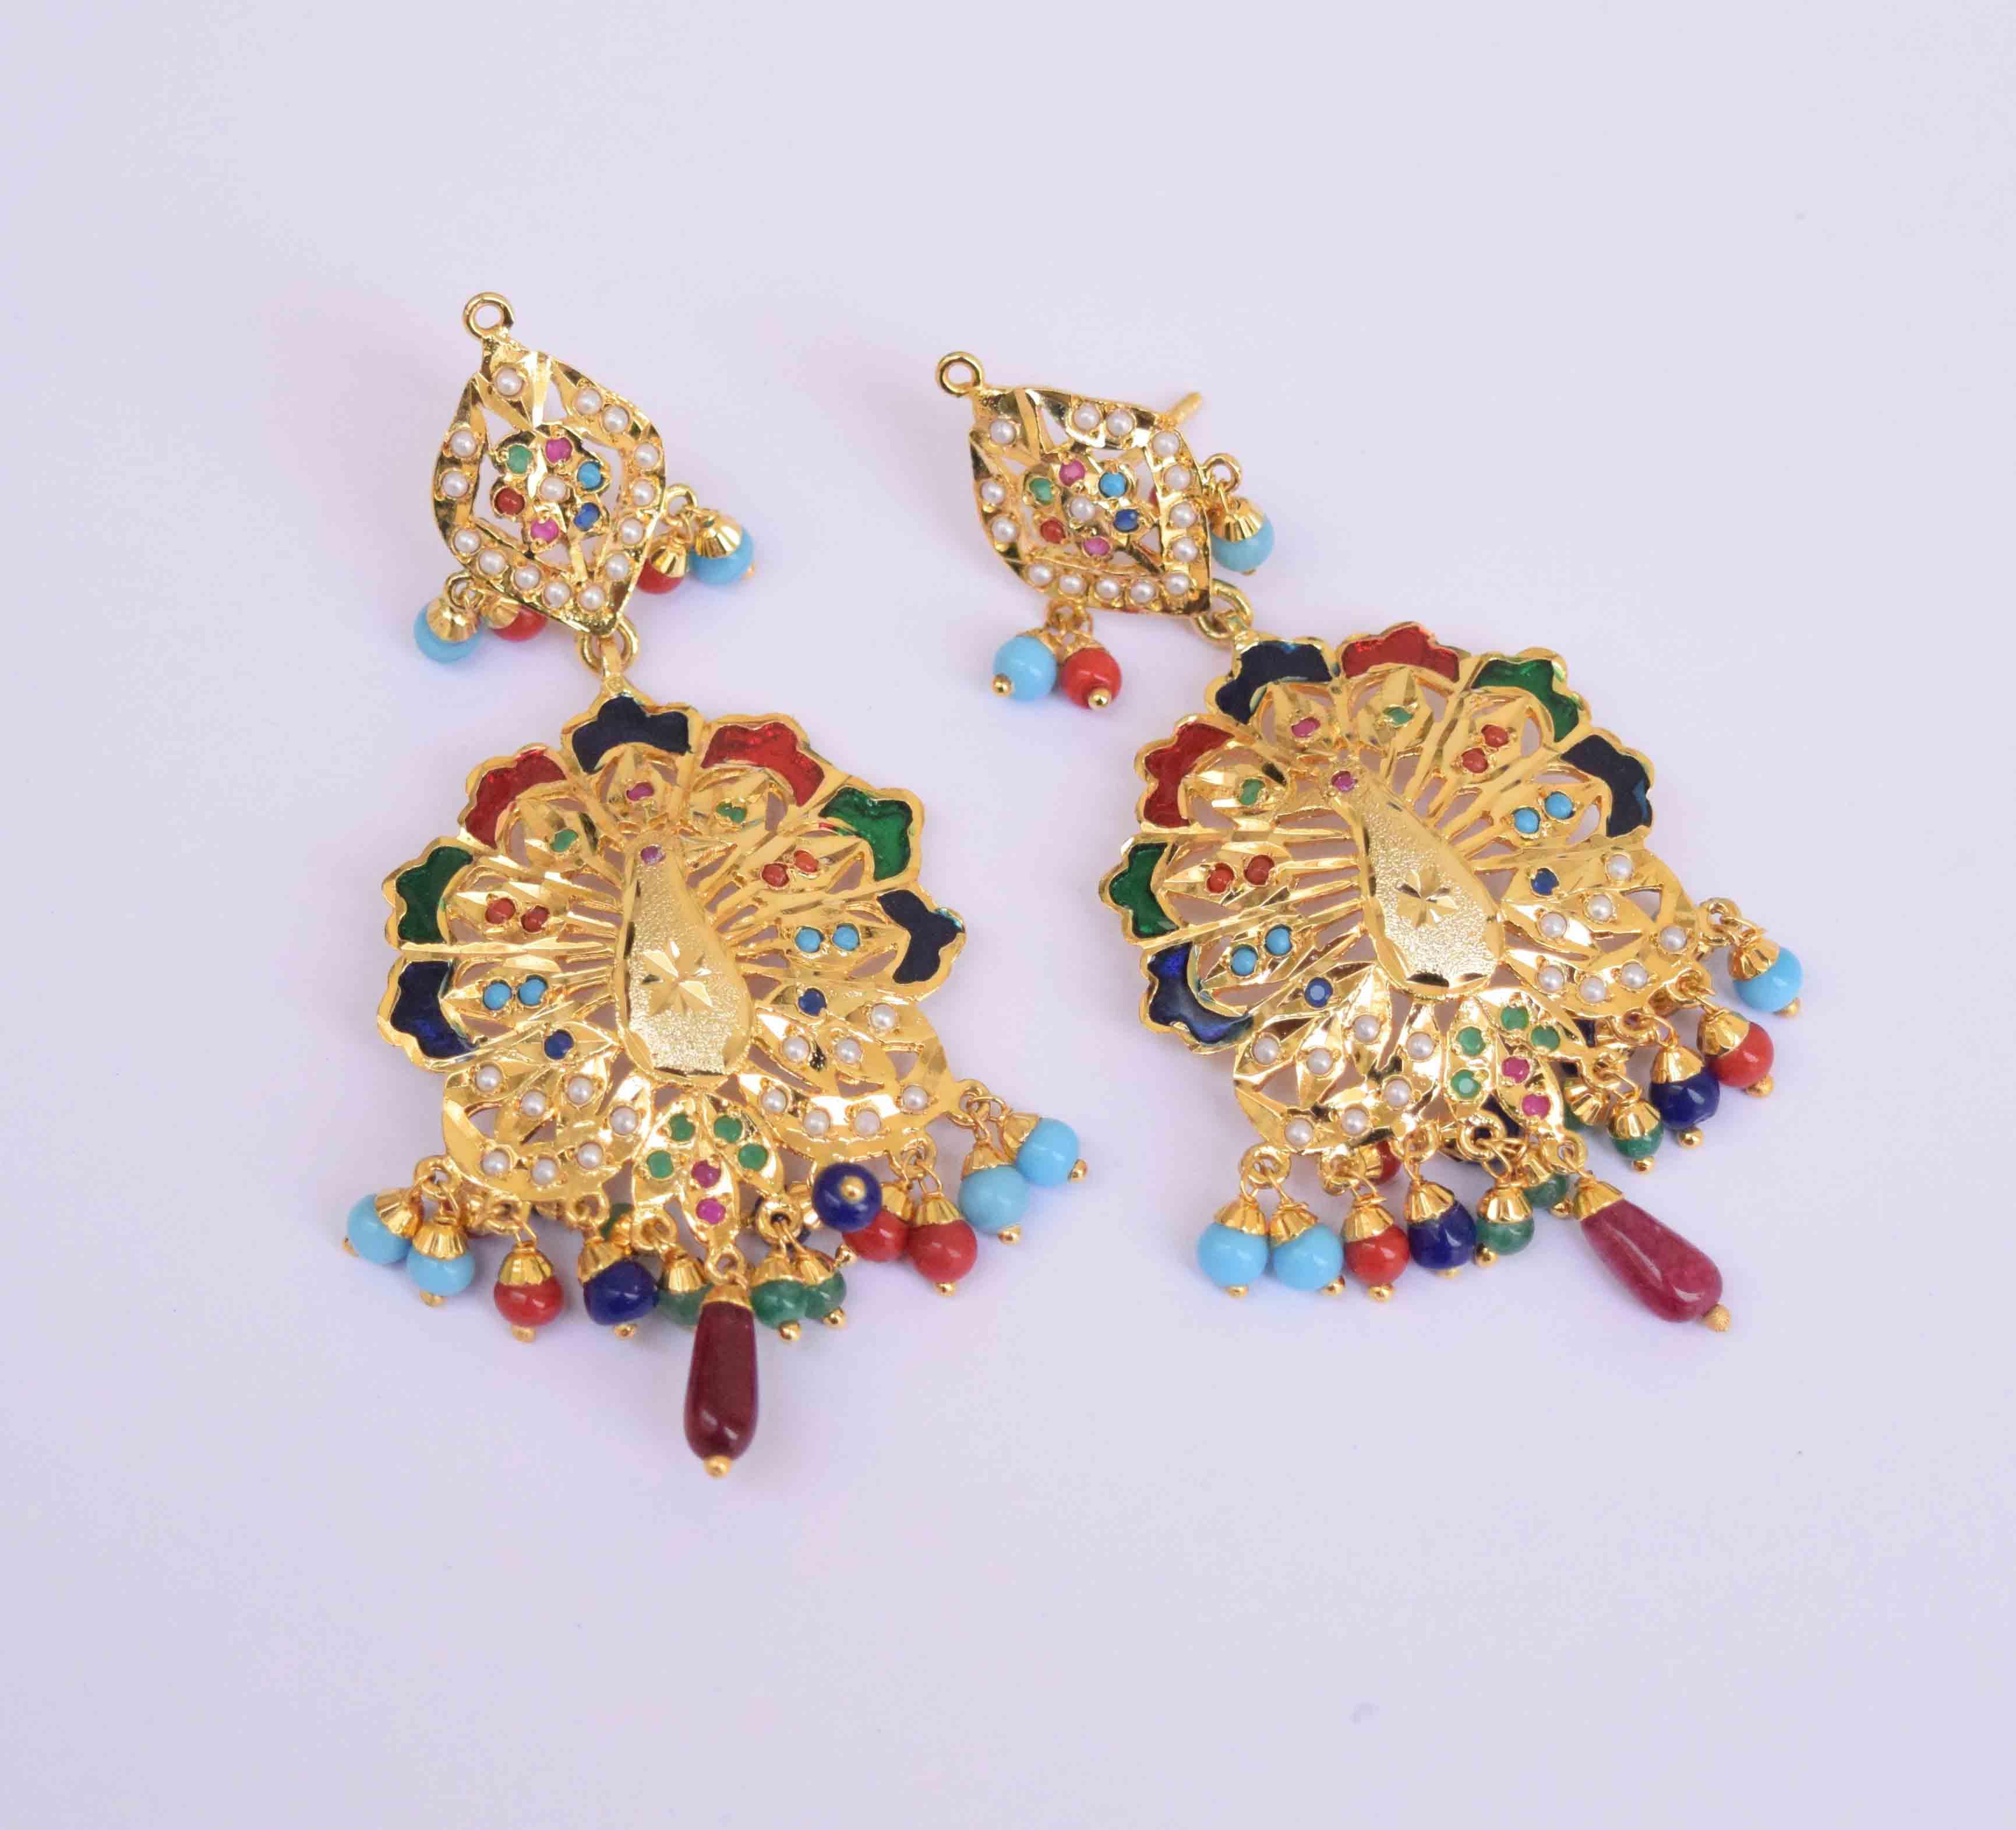 Punjabi Jadau Jewellery Things To Know Before You Get This